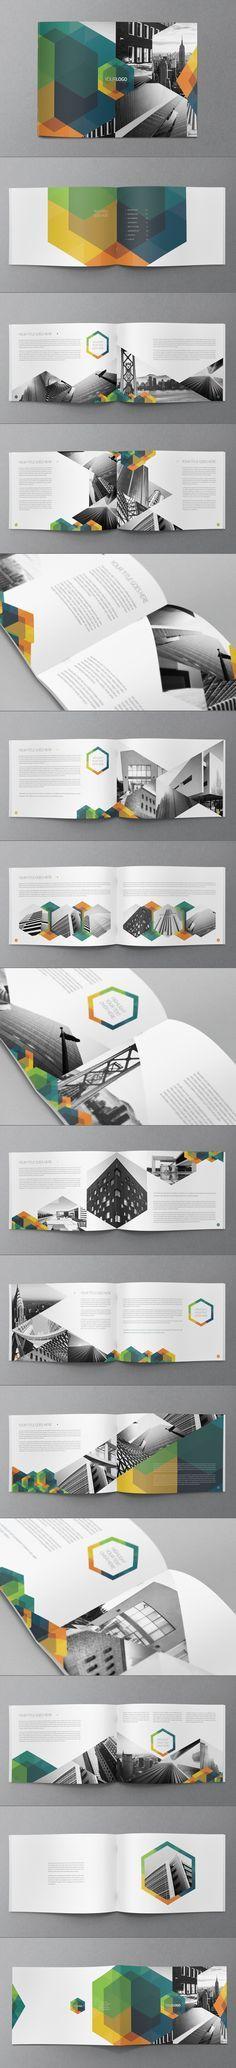 Hexo Brochure Design by Abra Design, via Behance #brochure #design